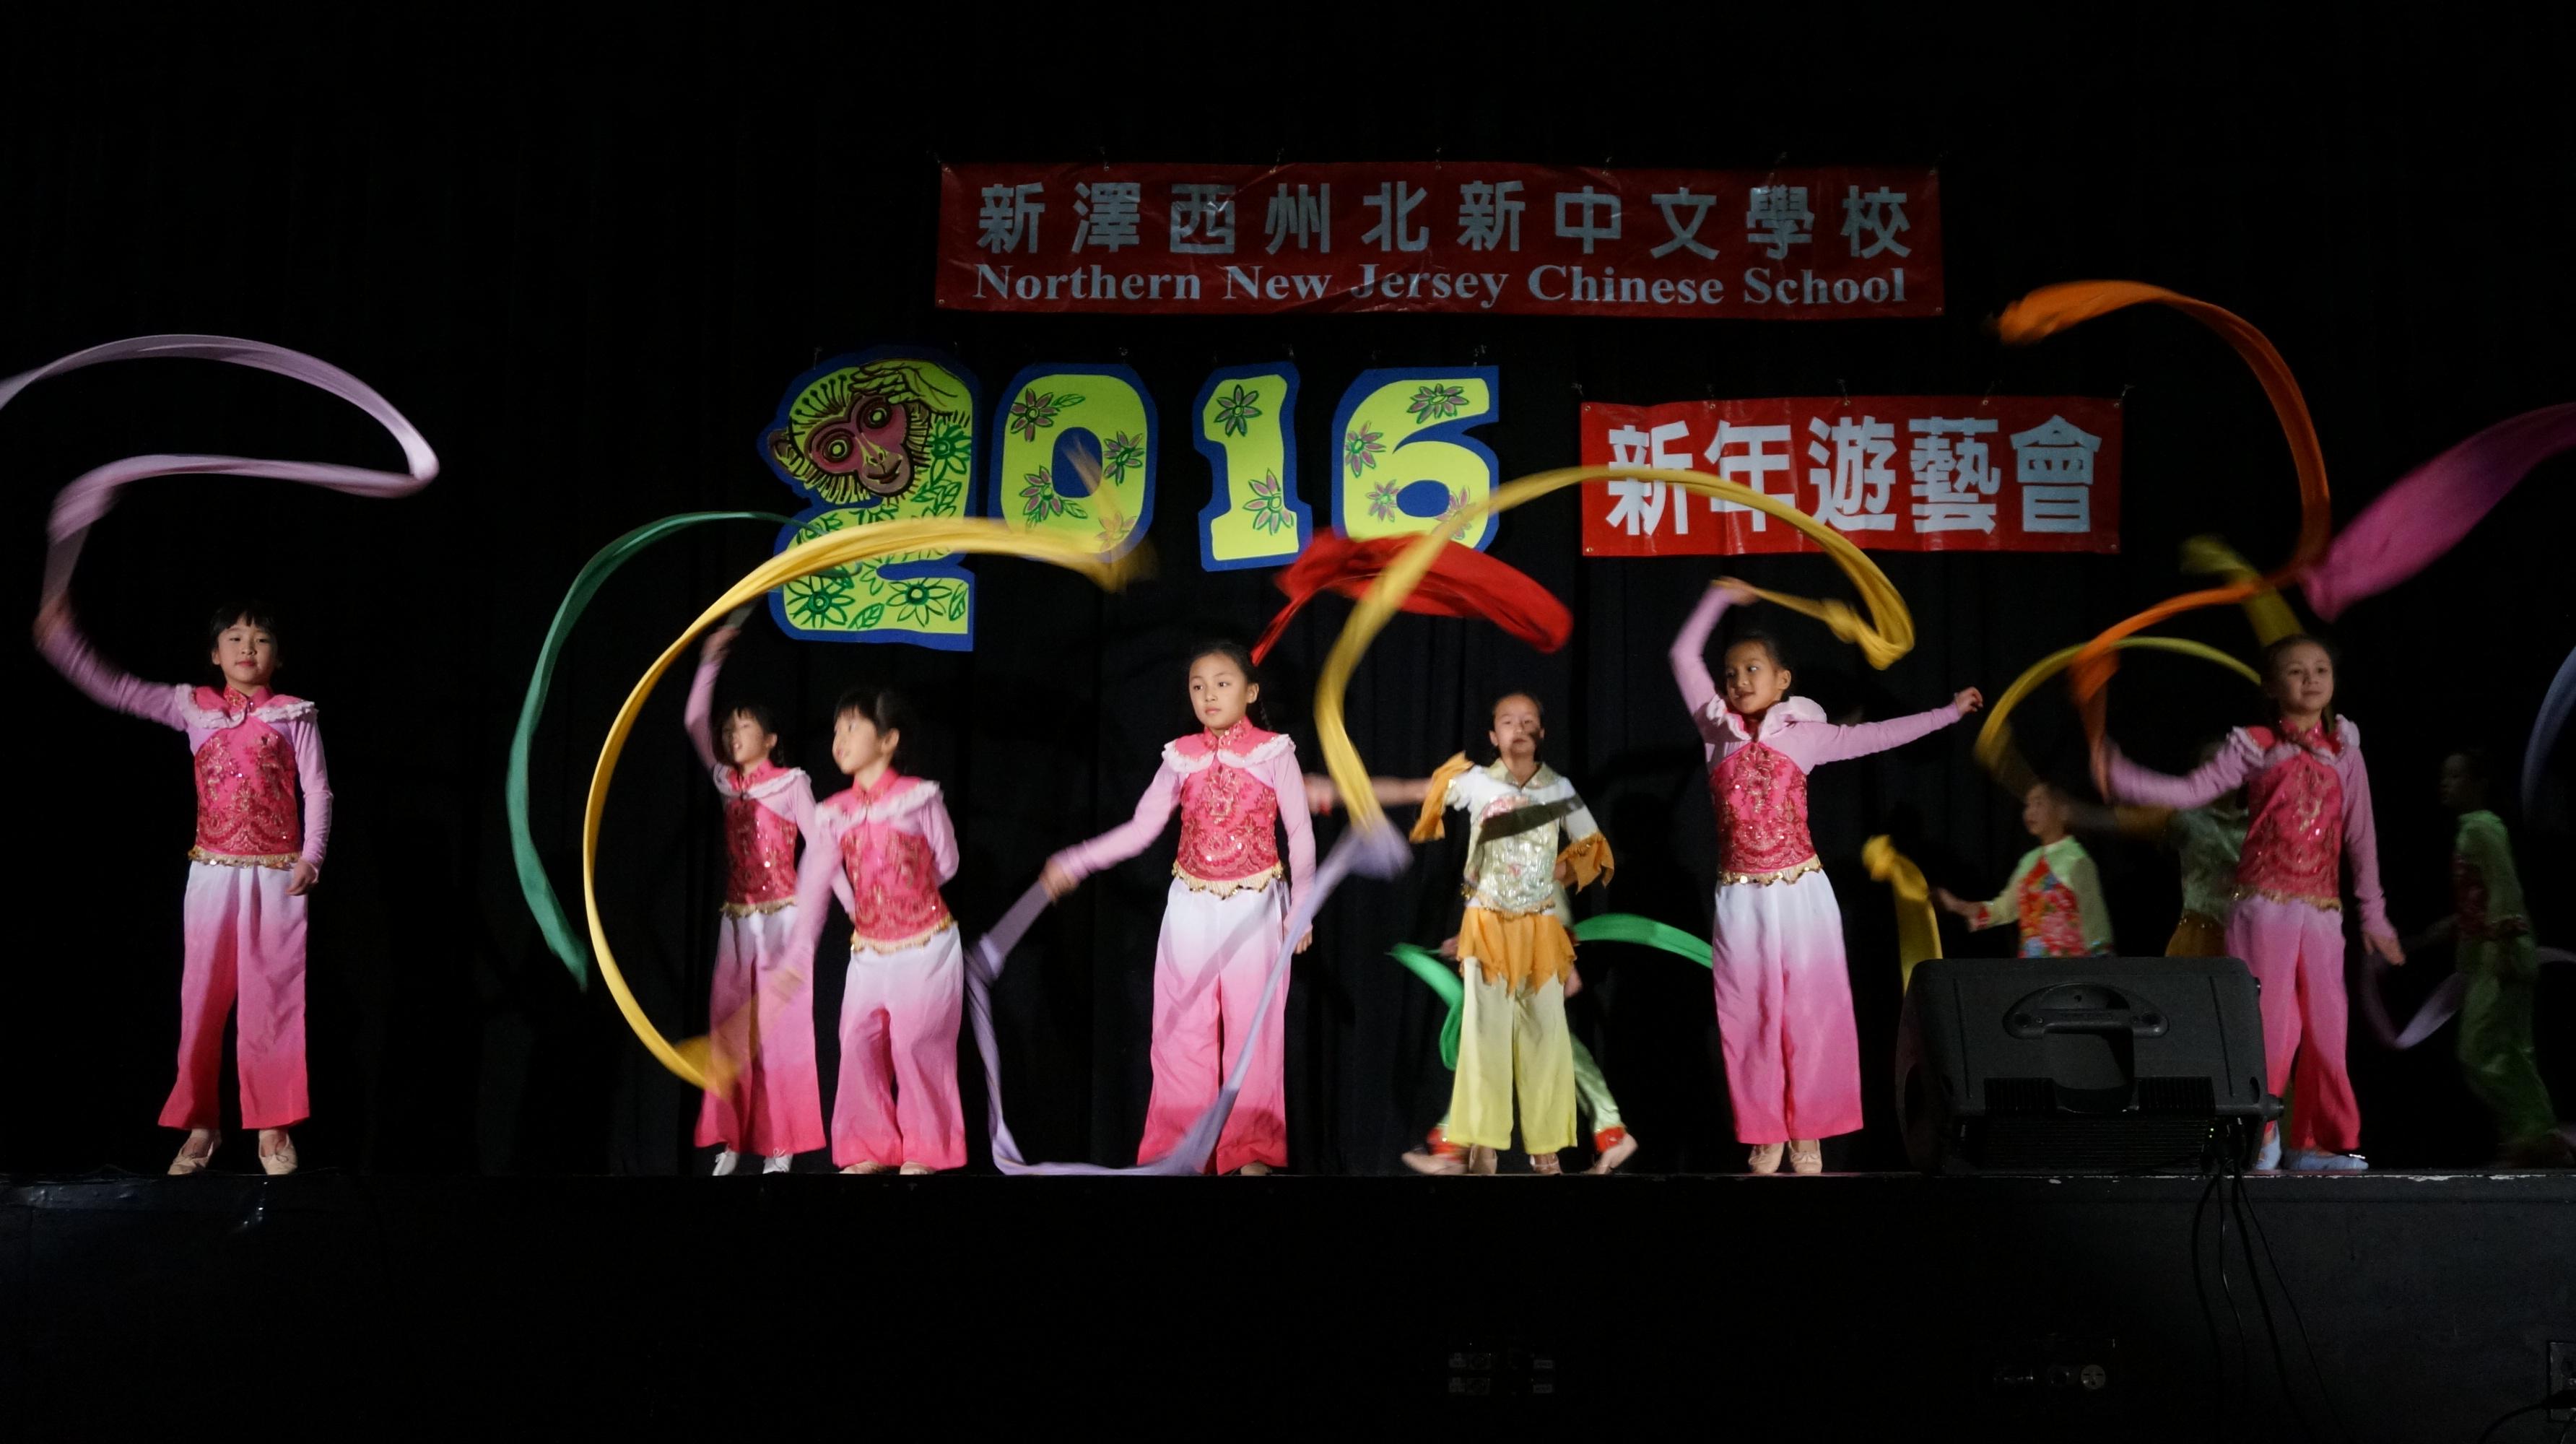 0bc0b75fc97bdb7b8340_aaa_Chinese_New_Year_pix_1.JPG